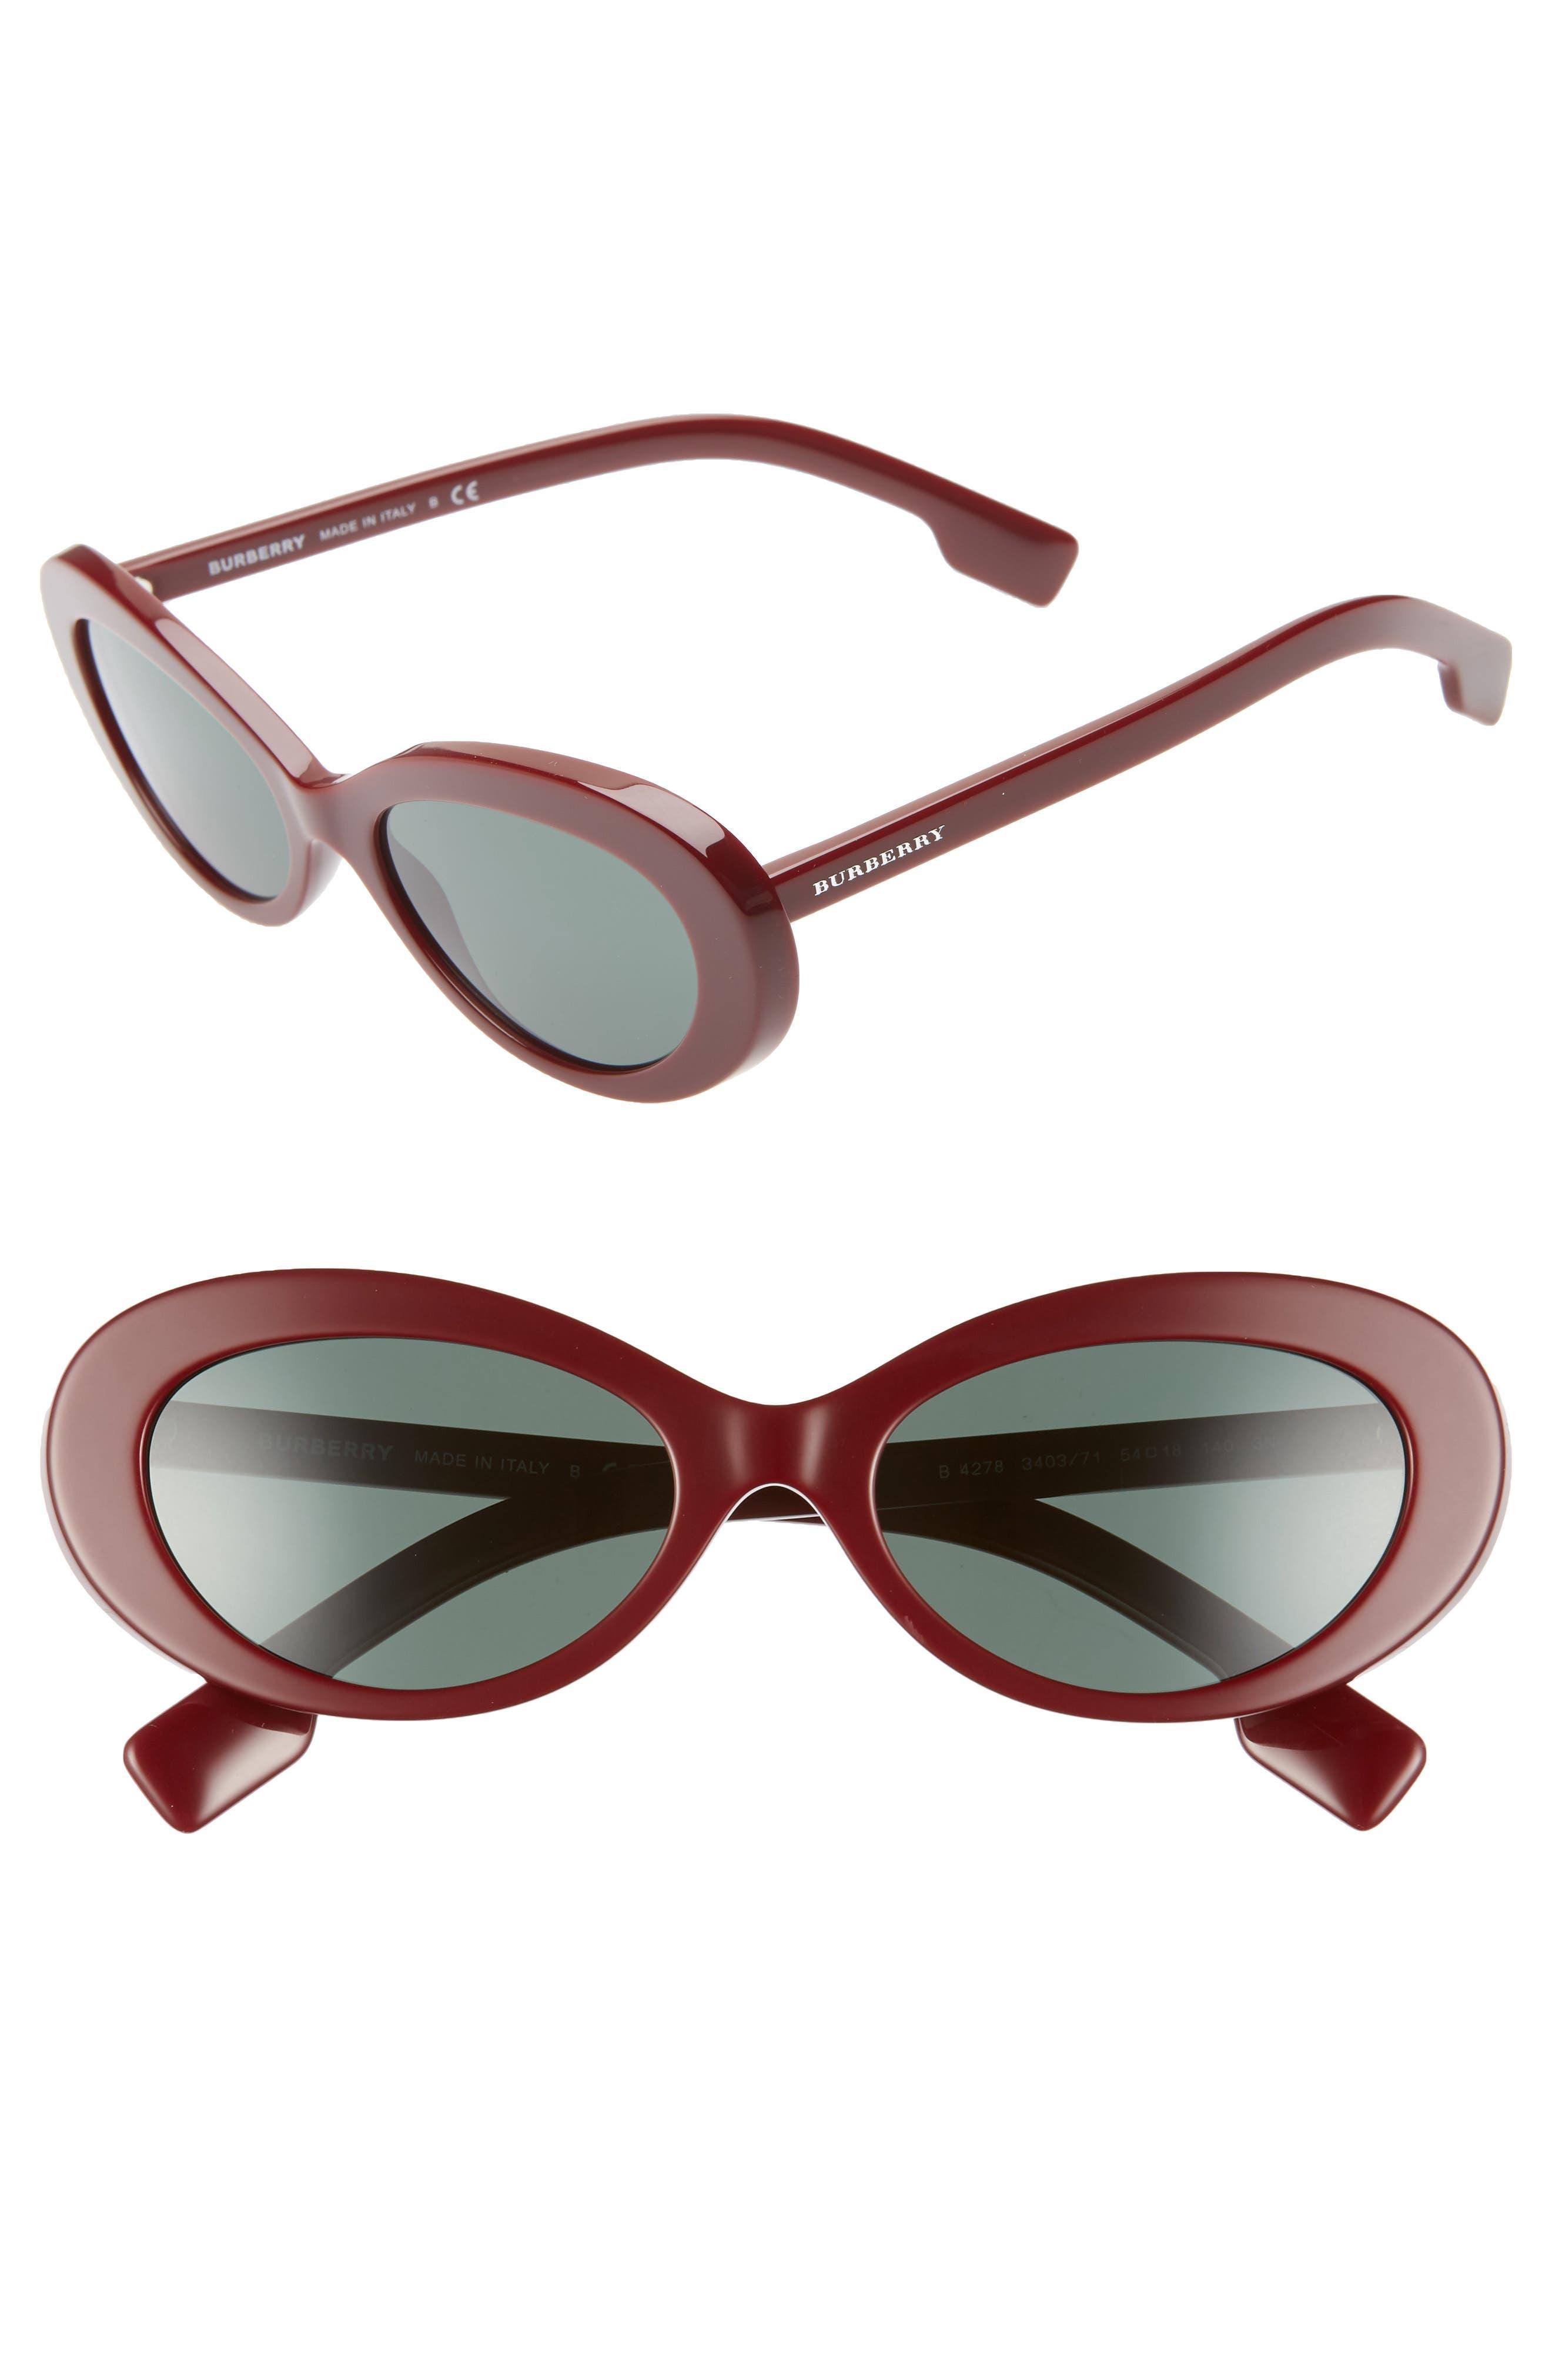 54mm Oval Sunglasses, Main, color, BORDEAUX SOLID